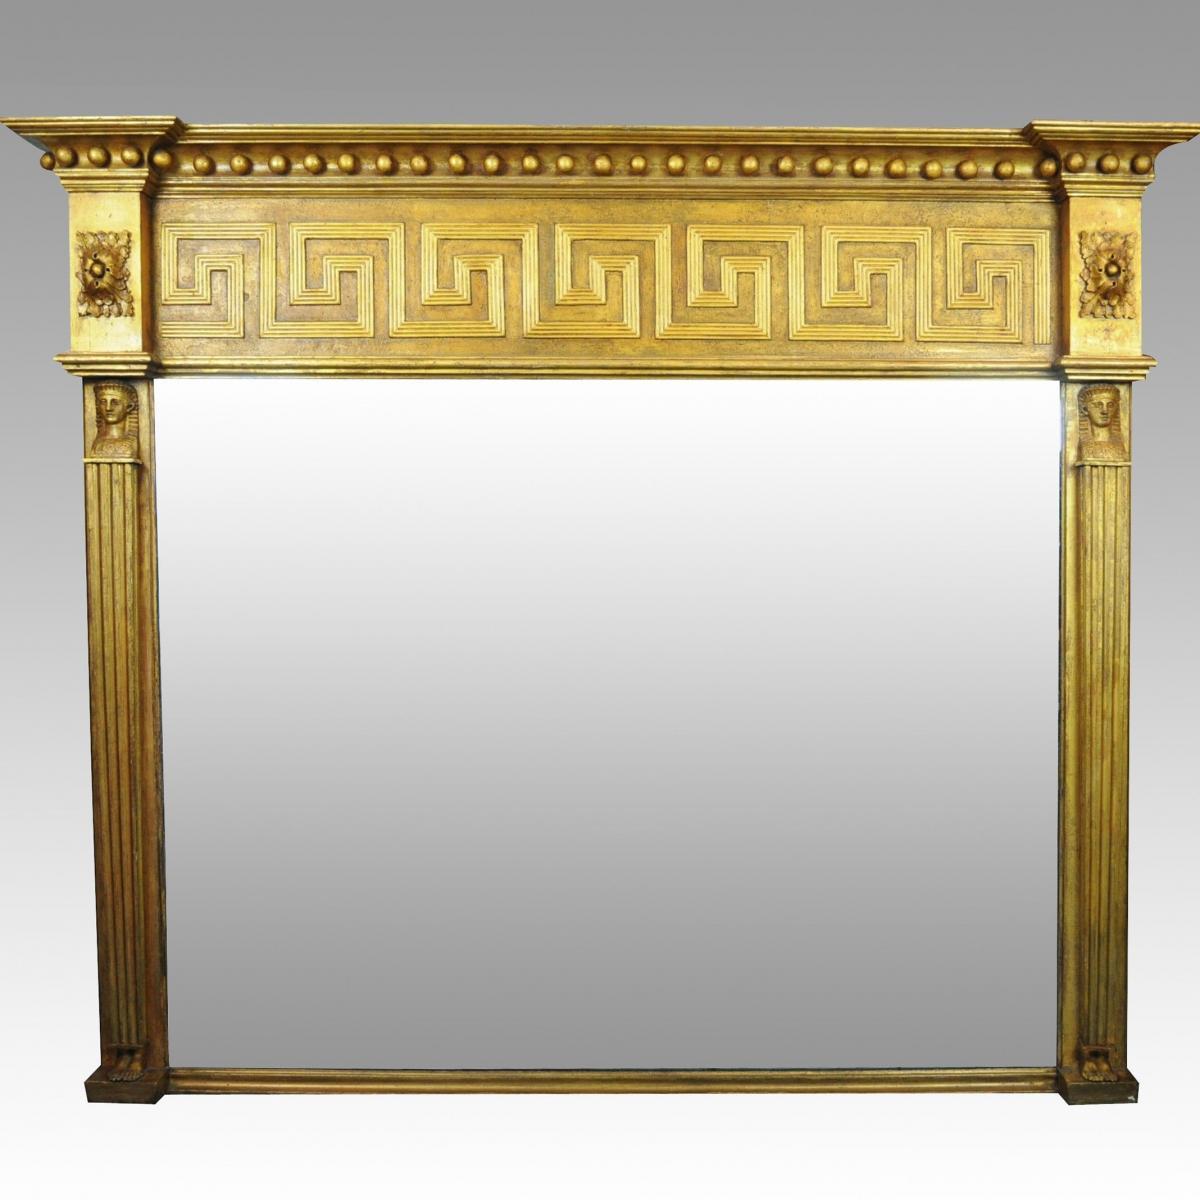 Large Regency Overmantel/Overmantle Mirror